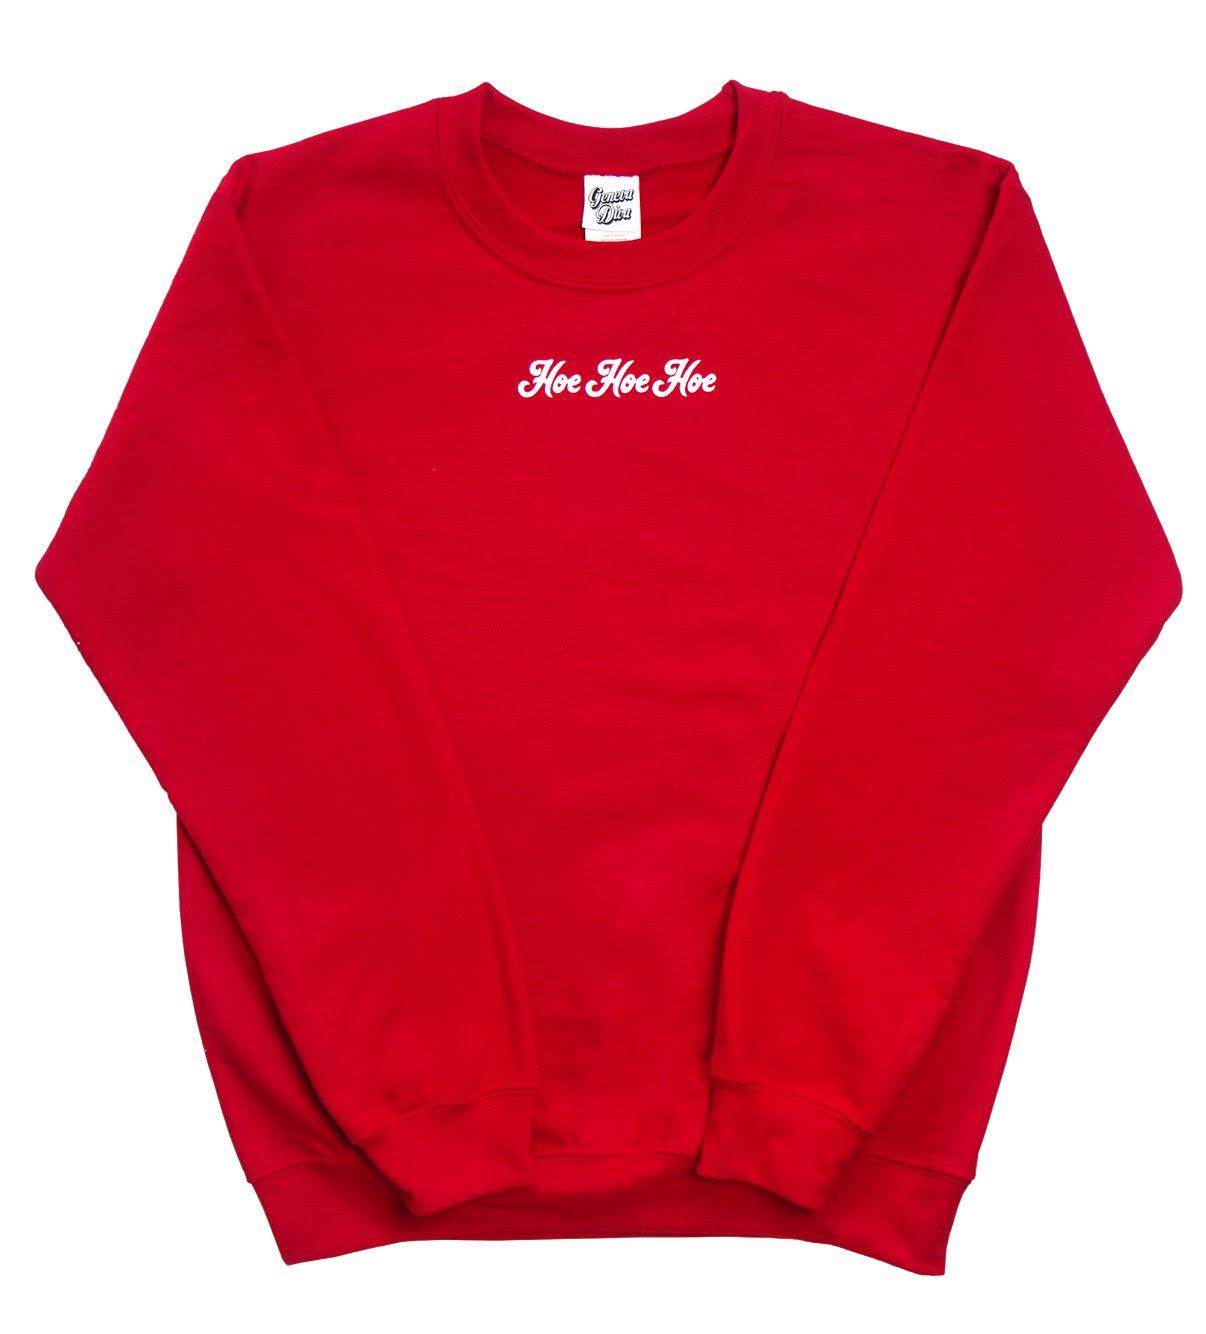 Hoe Hoe Hoe sweatshirt, $40  genevadivanyc.com